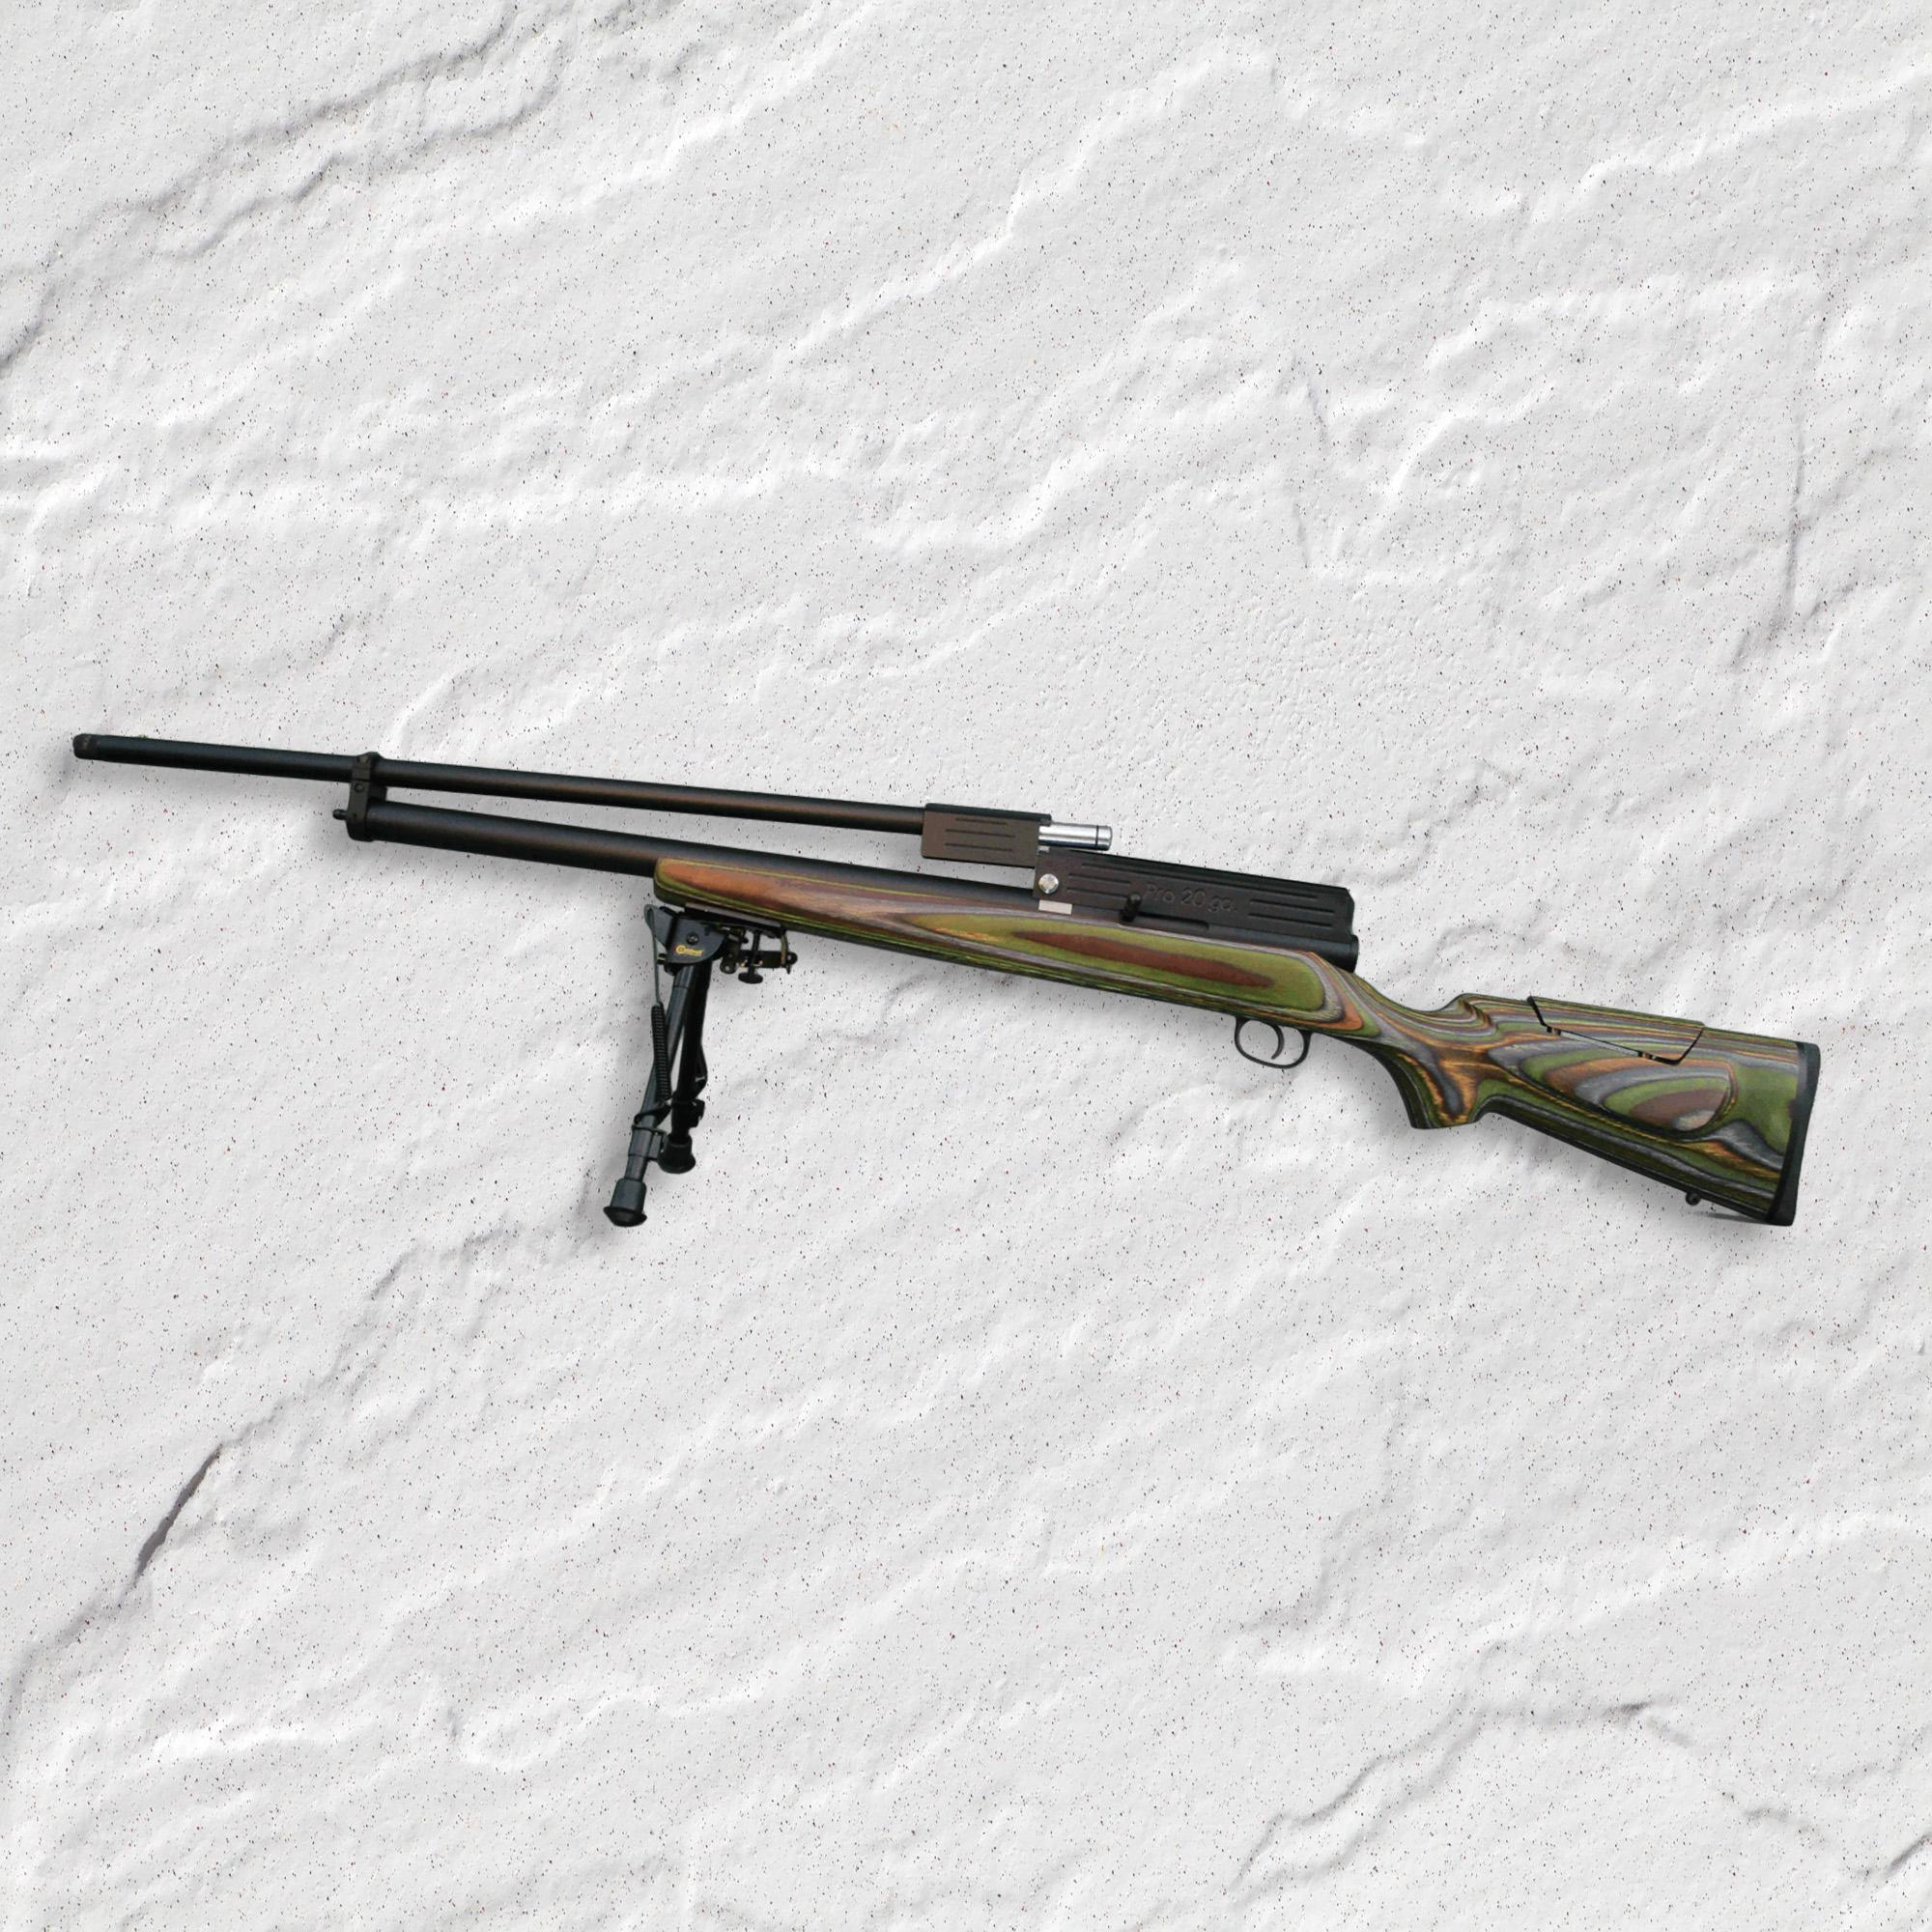 Pro 20 Air Shotgun Hunting Big Bore Air Guns By Pbba Inc